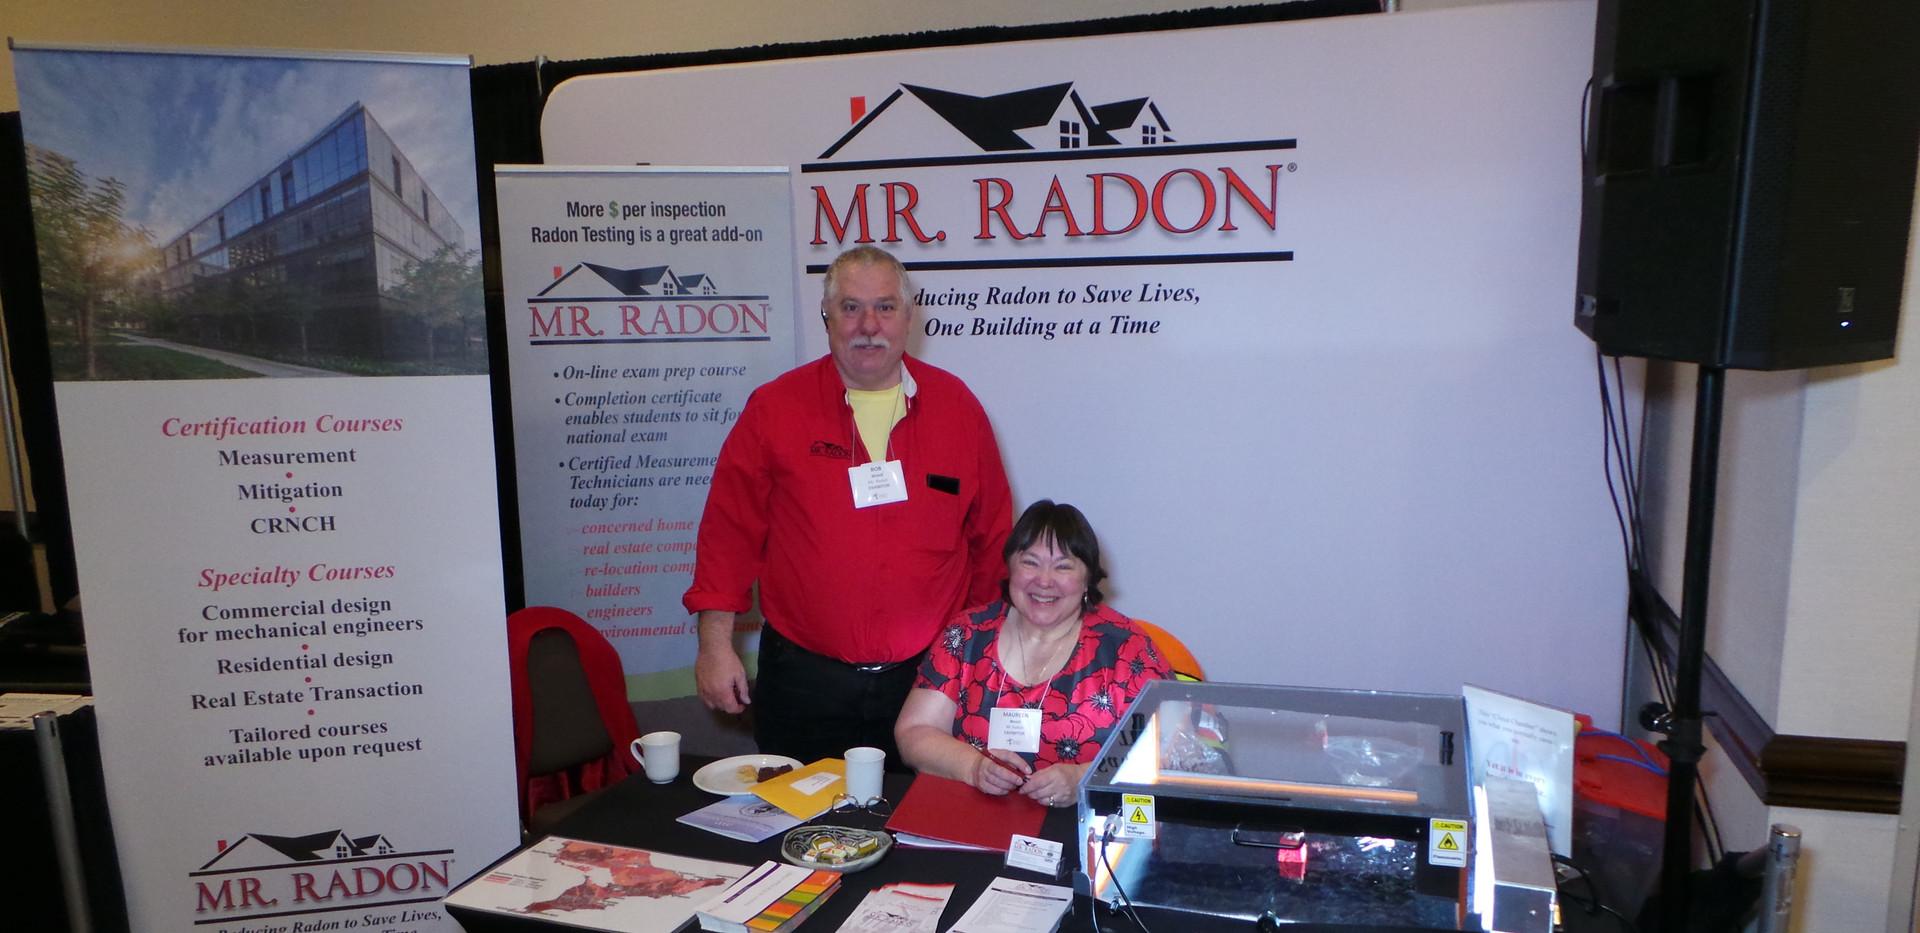 OED20 MR RADON - 2 20200301_hhJPG.JPG